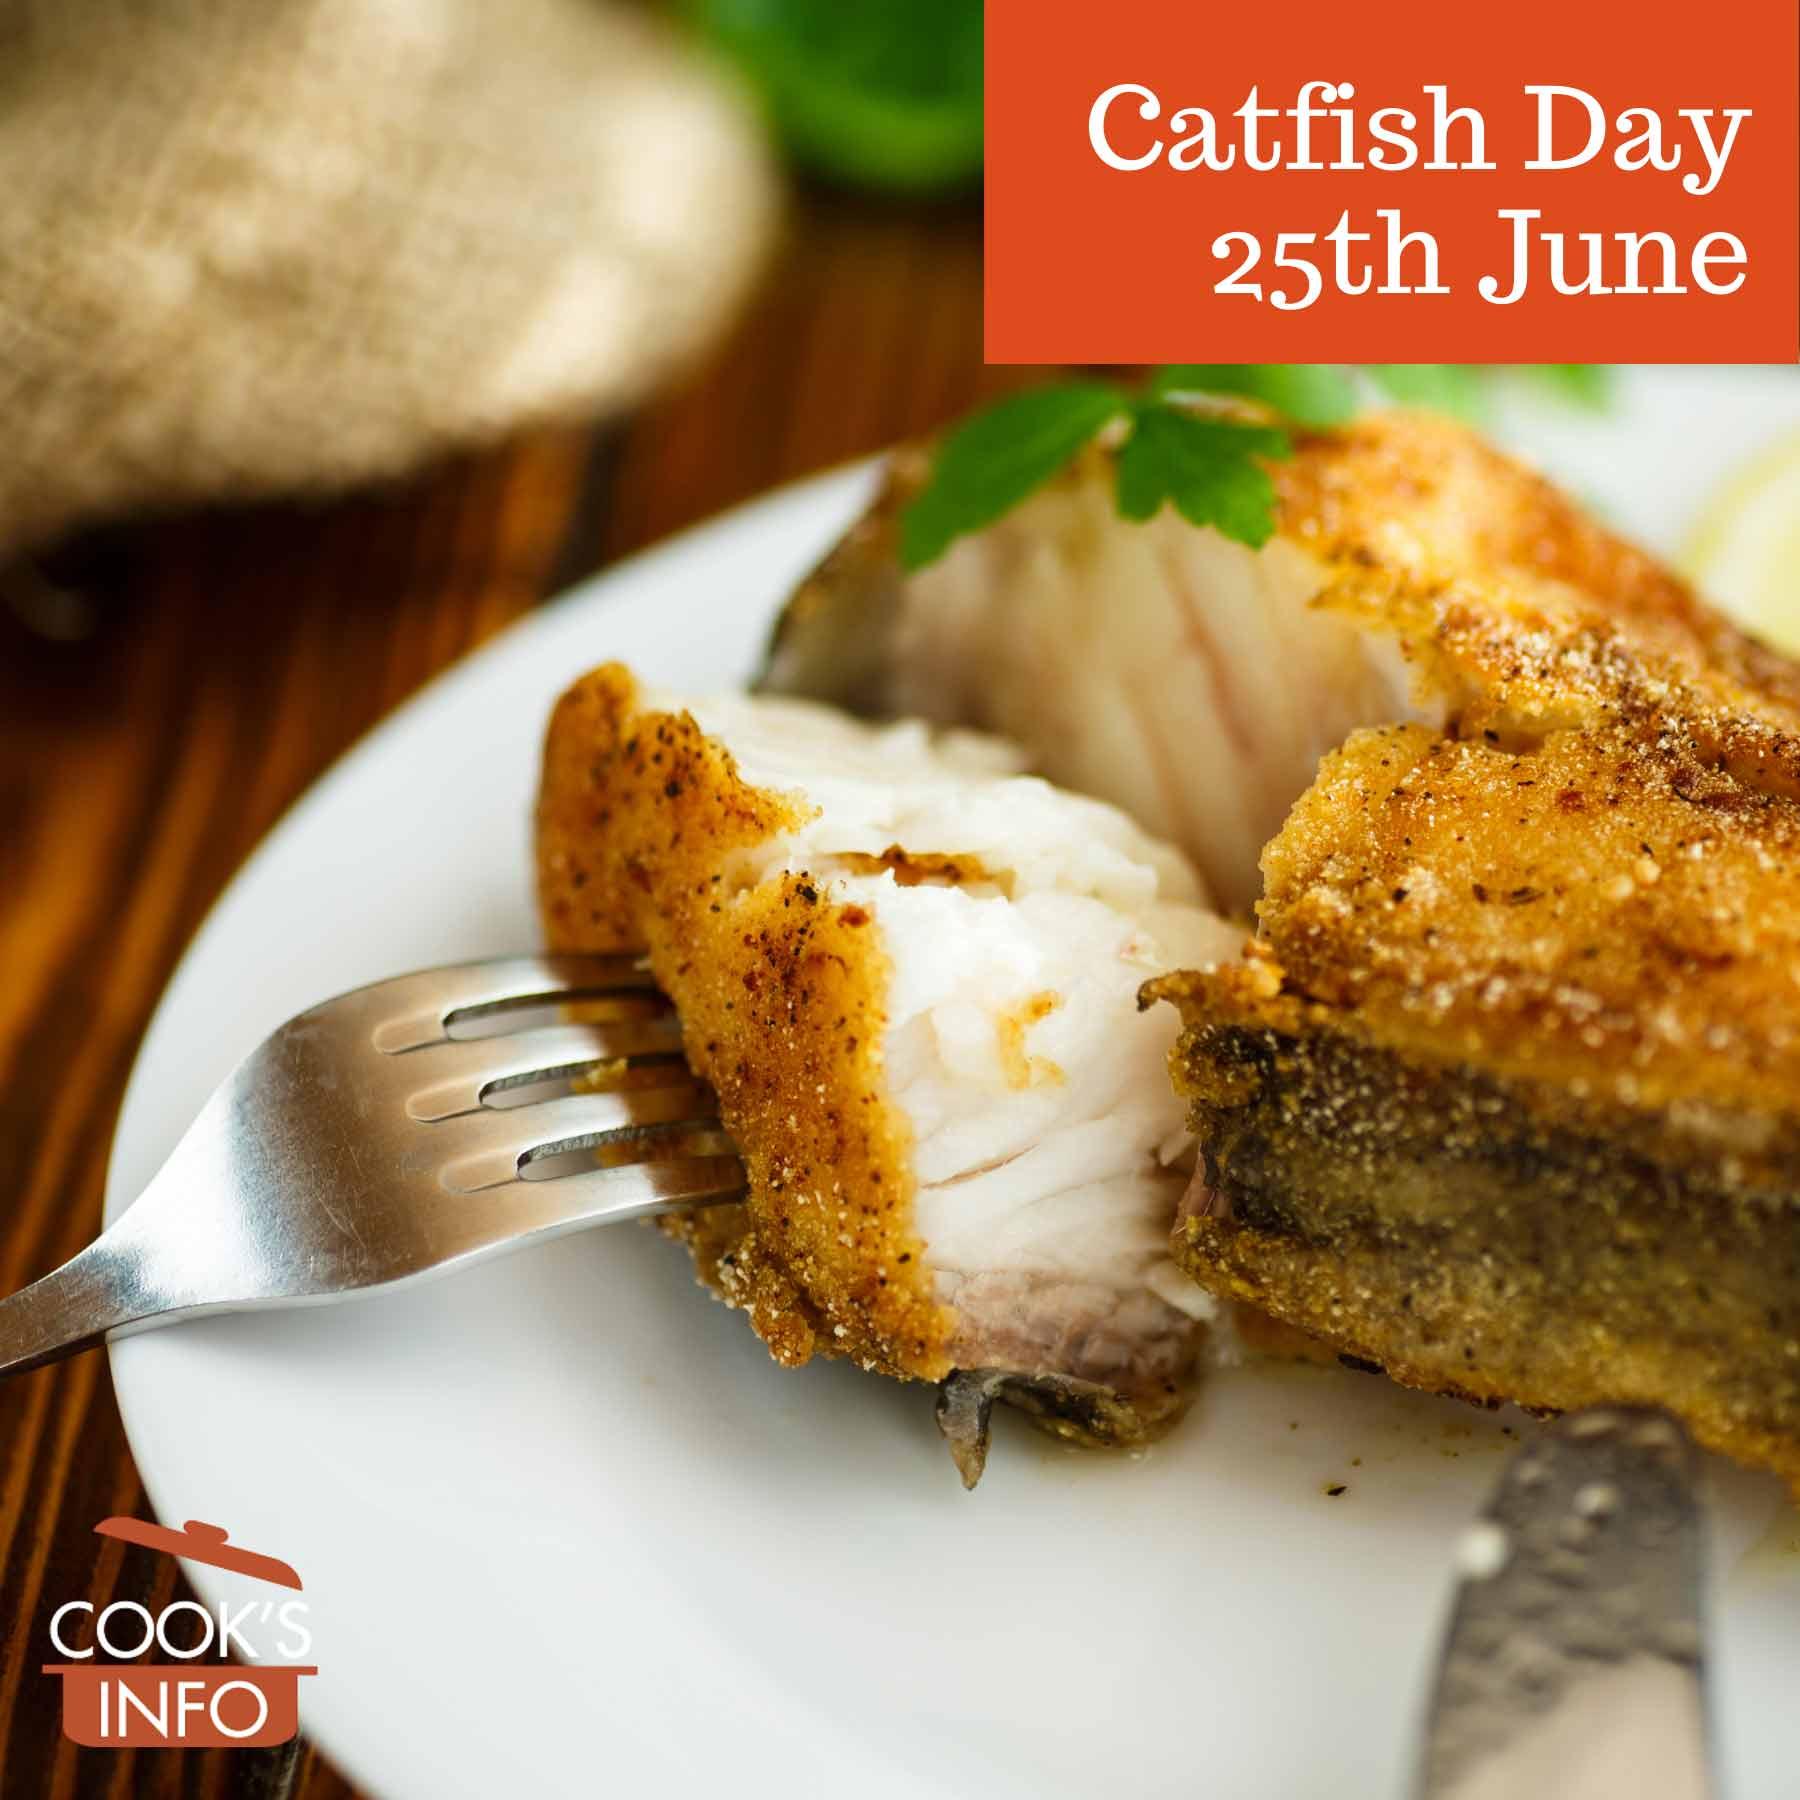 Catfish fried in batter